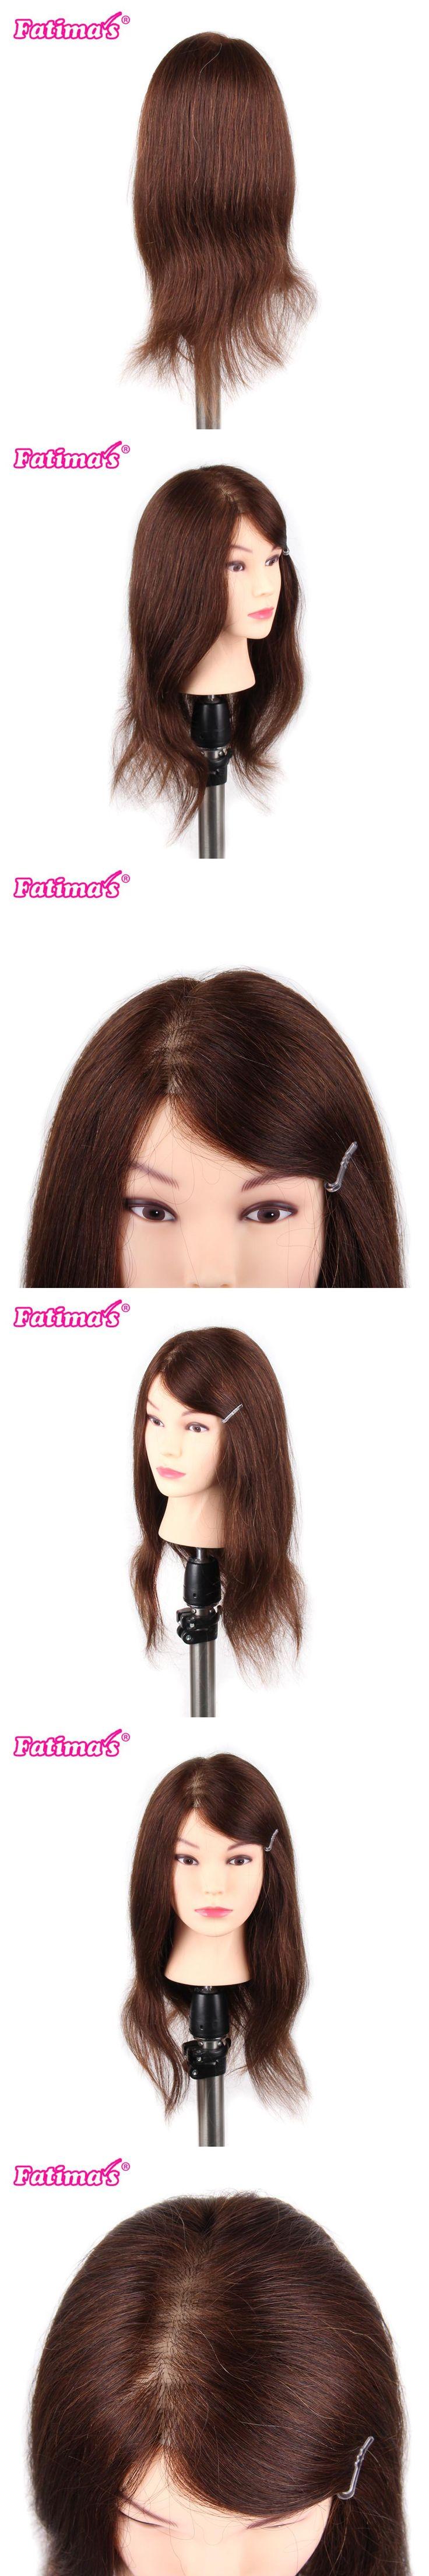 Fatimas100% Real Human Hair Beard Hairdressing Training Man Head Mannequin Doll Natural Hair High Quality Practice Training Head